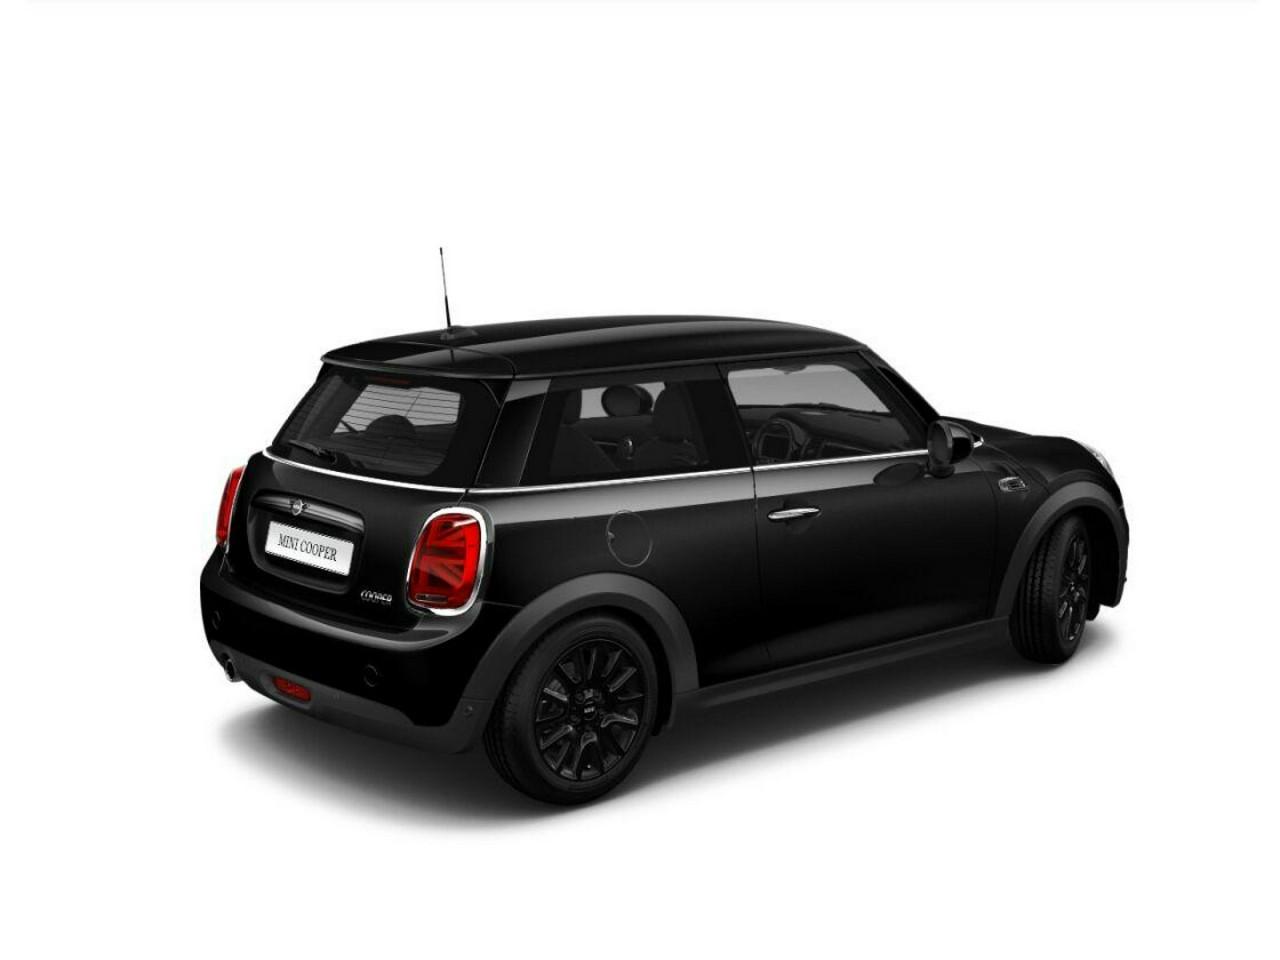 Mini Cooper 3drz | LED | Asyst. parkowania | Dostęp komf. |_1